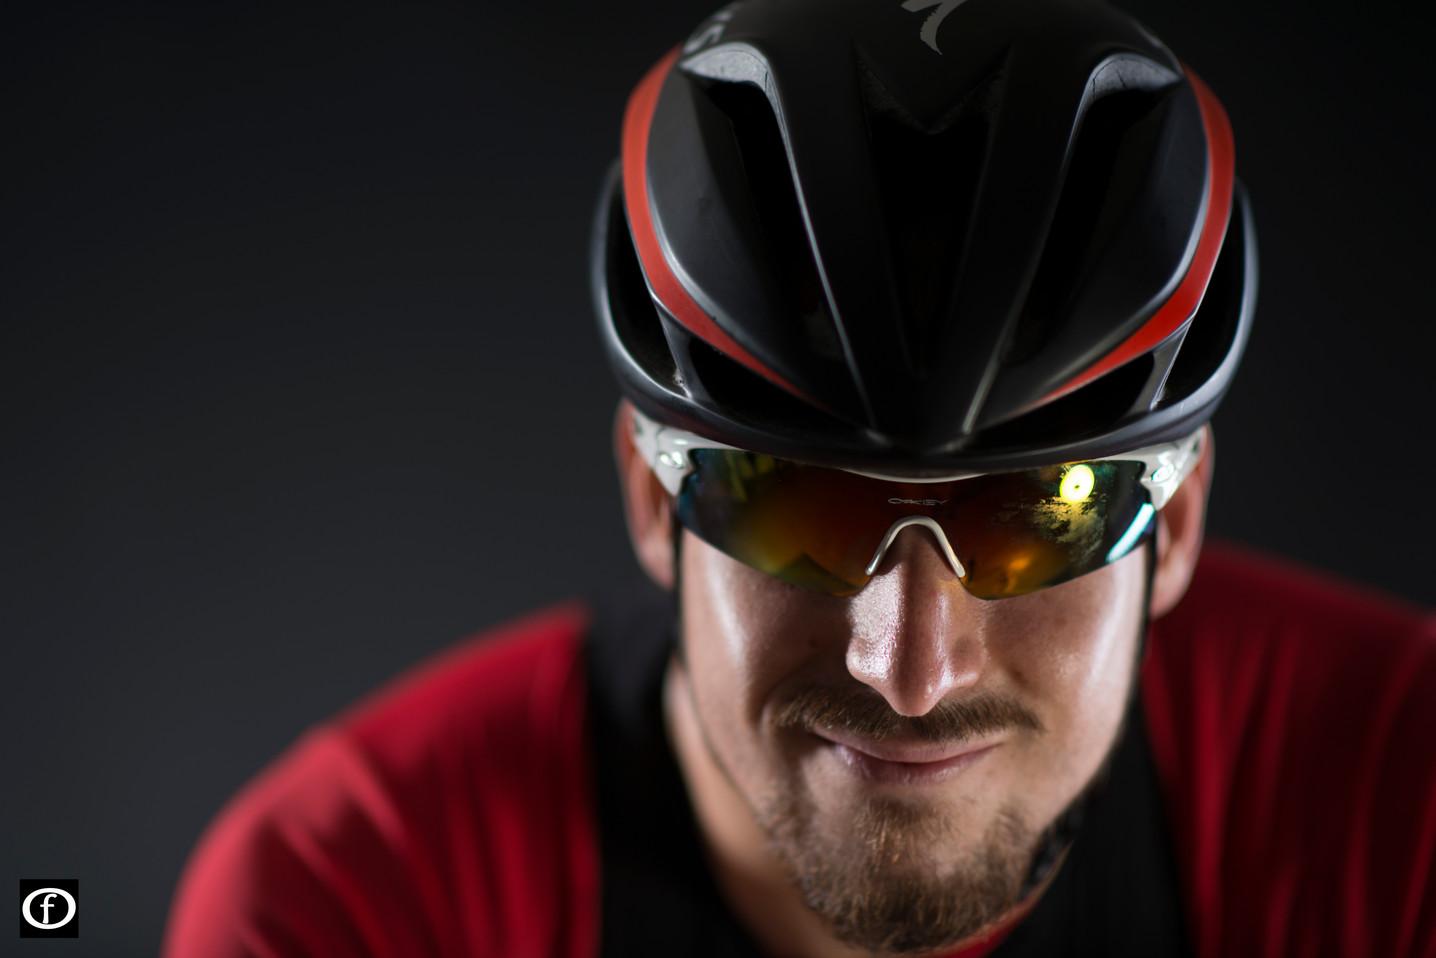 Triatleta Felipe Aguayo-9190.jpg